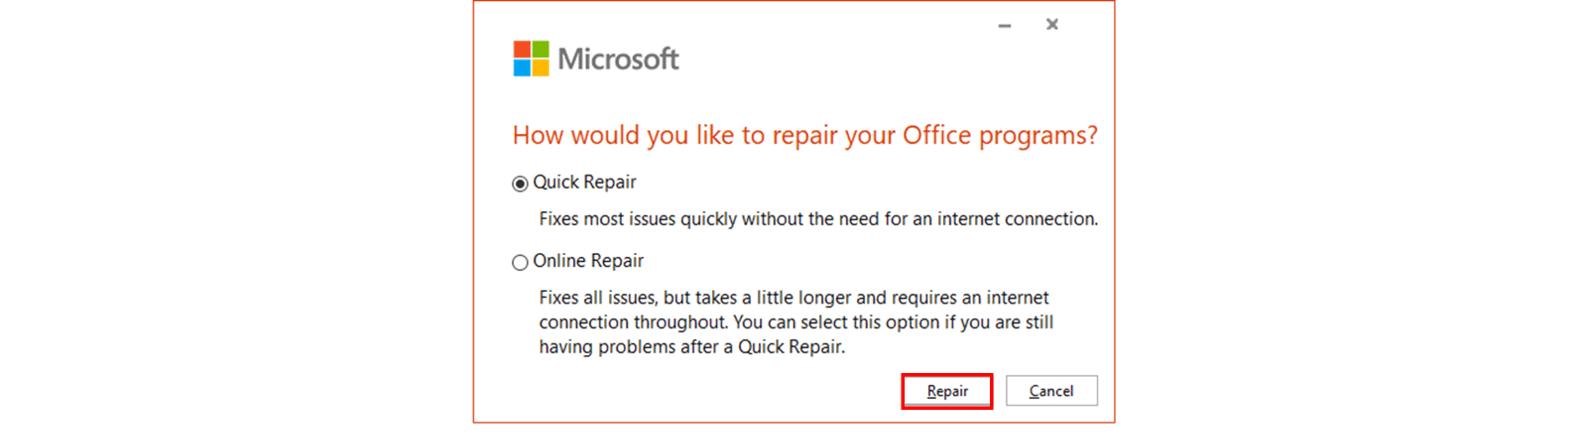 Microsoft Office repair pop-up